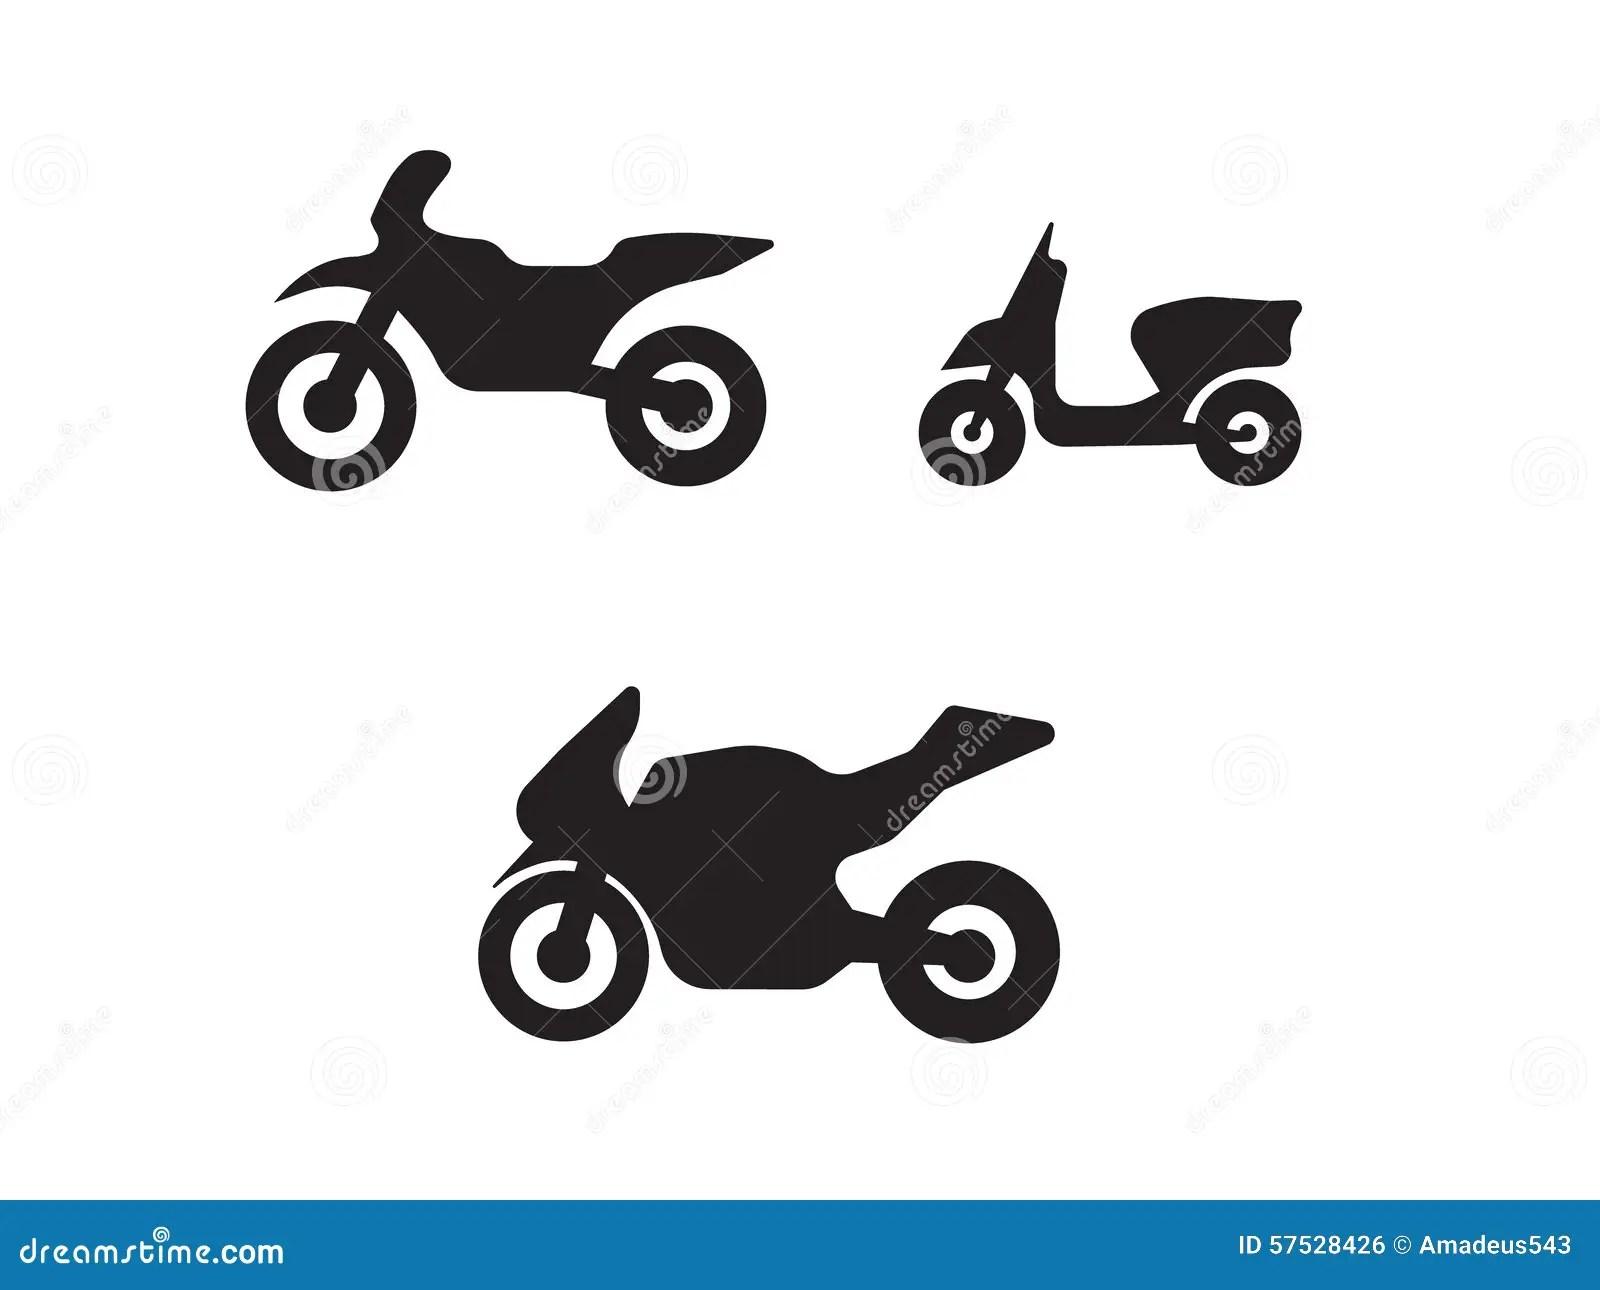 Motorbike Motorcycle Symbols In Black Silhouette Stock